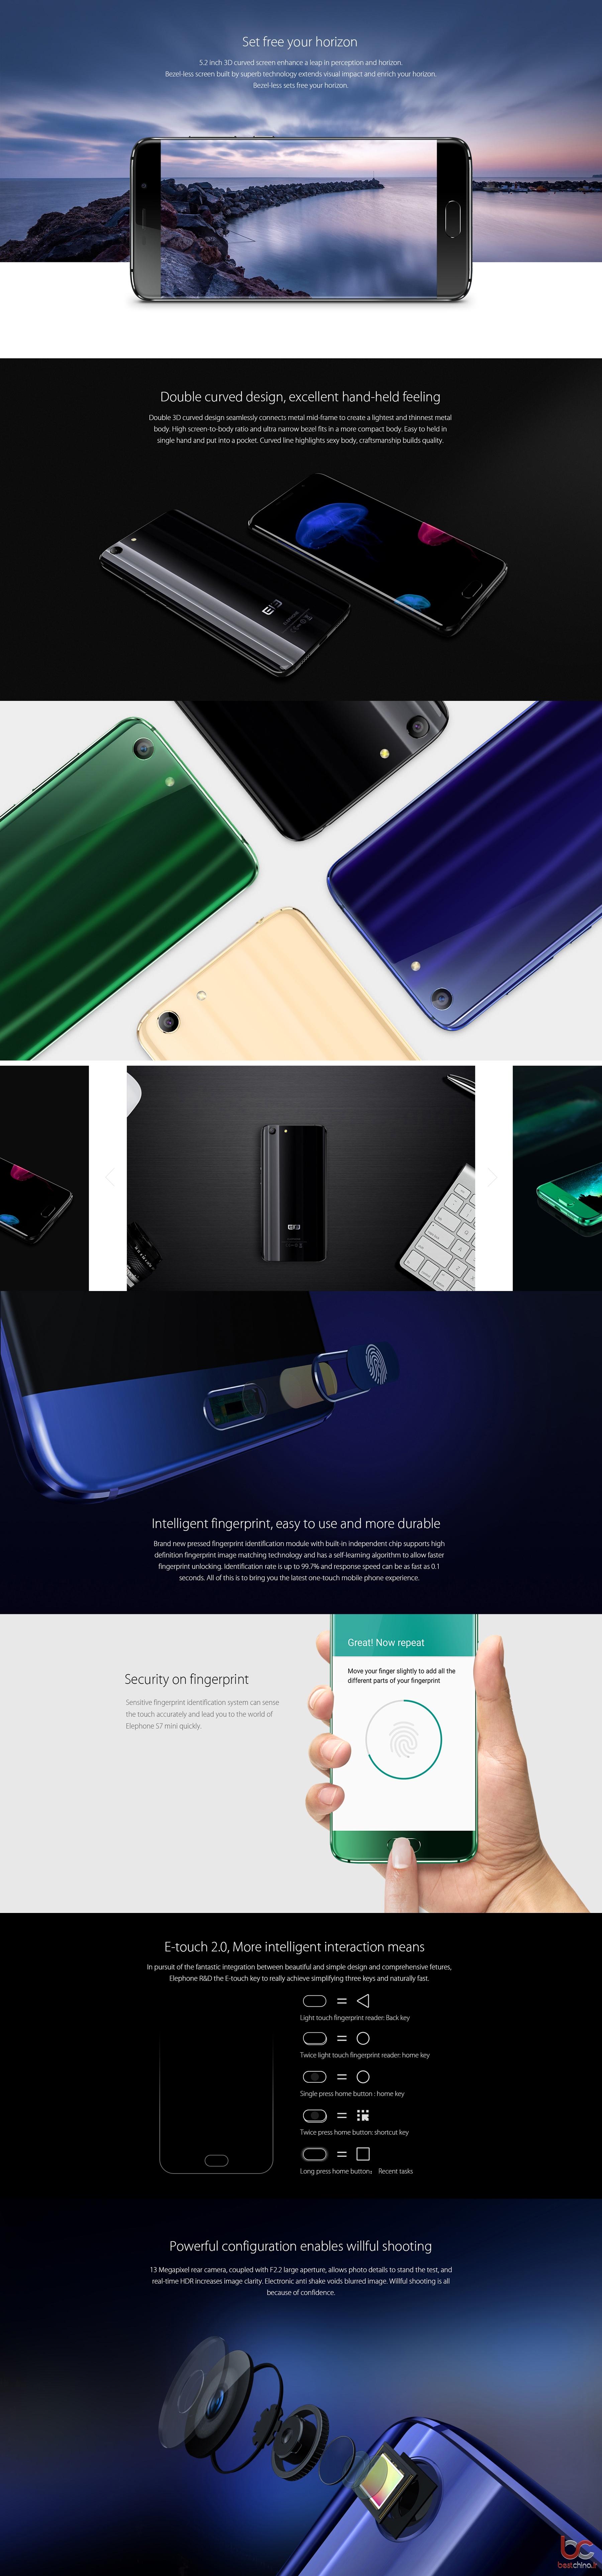 elephone-s7-mini-13